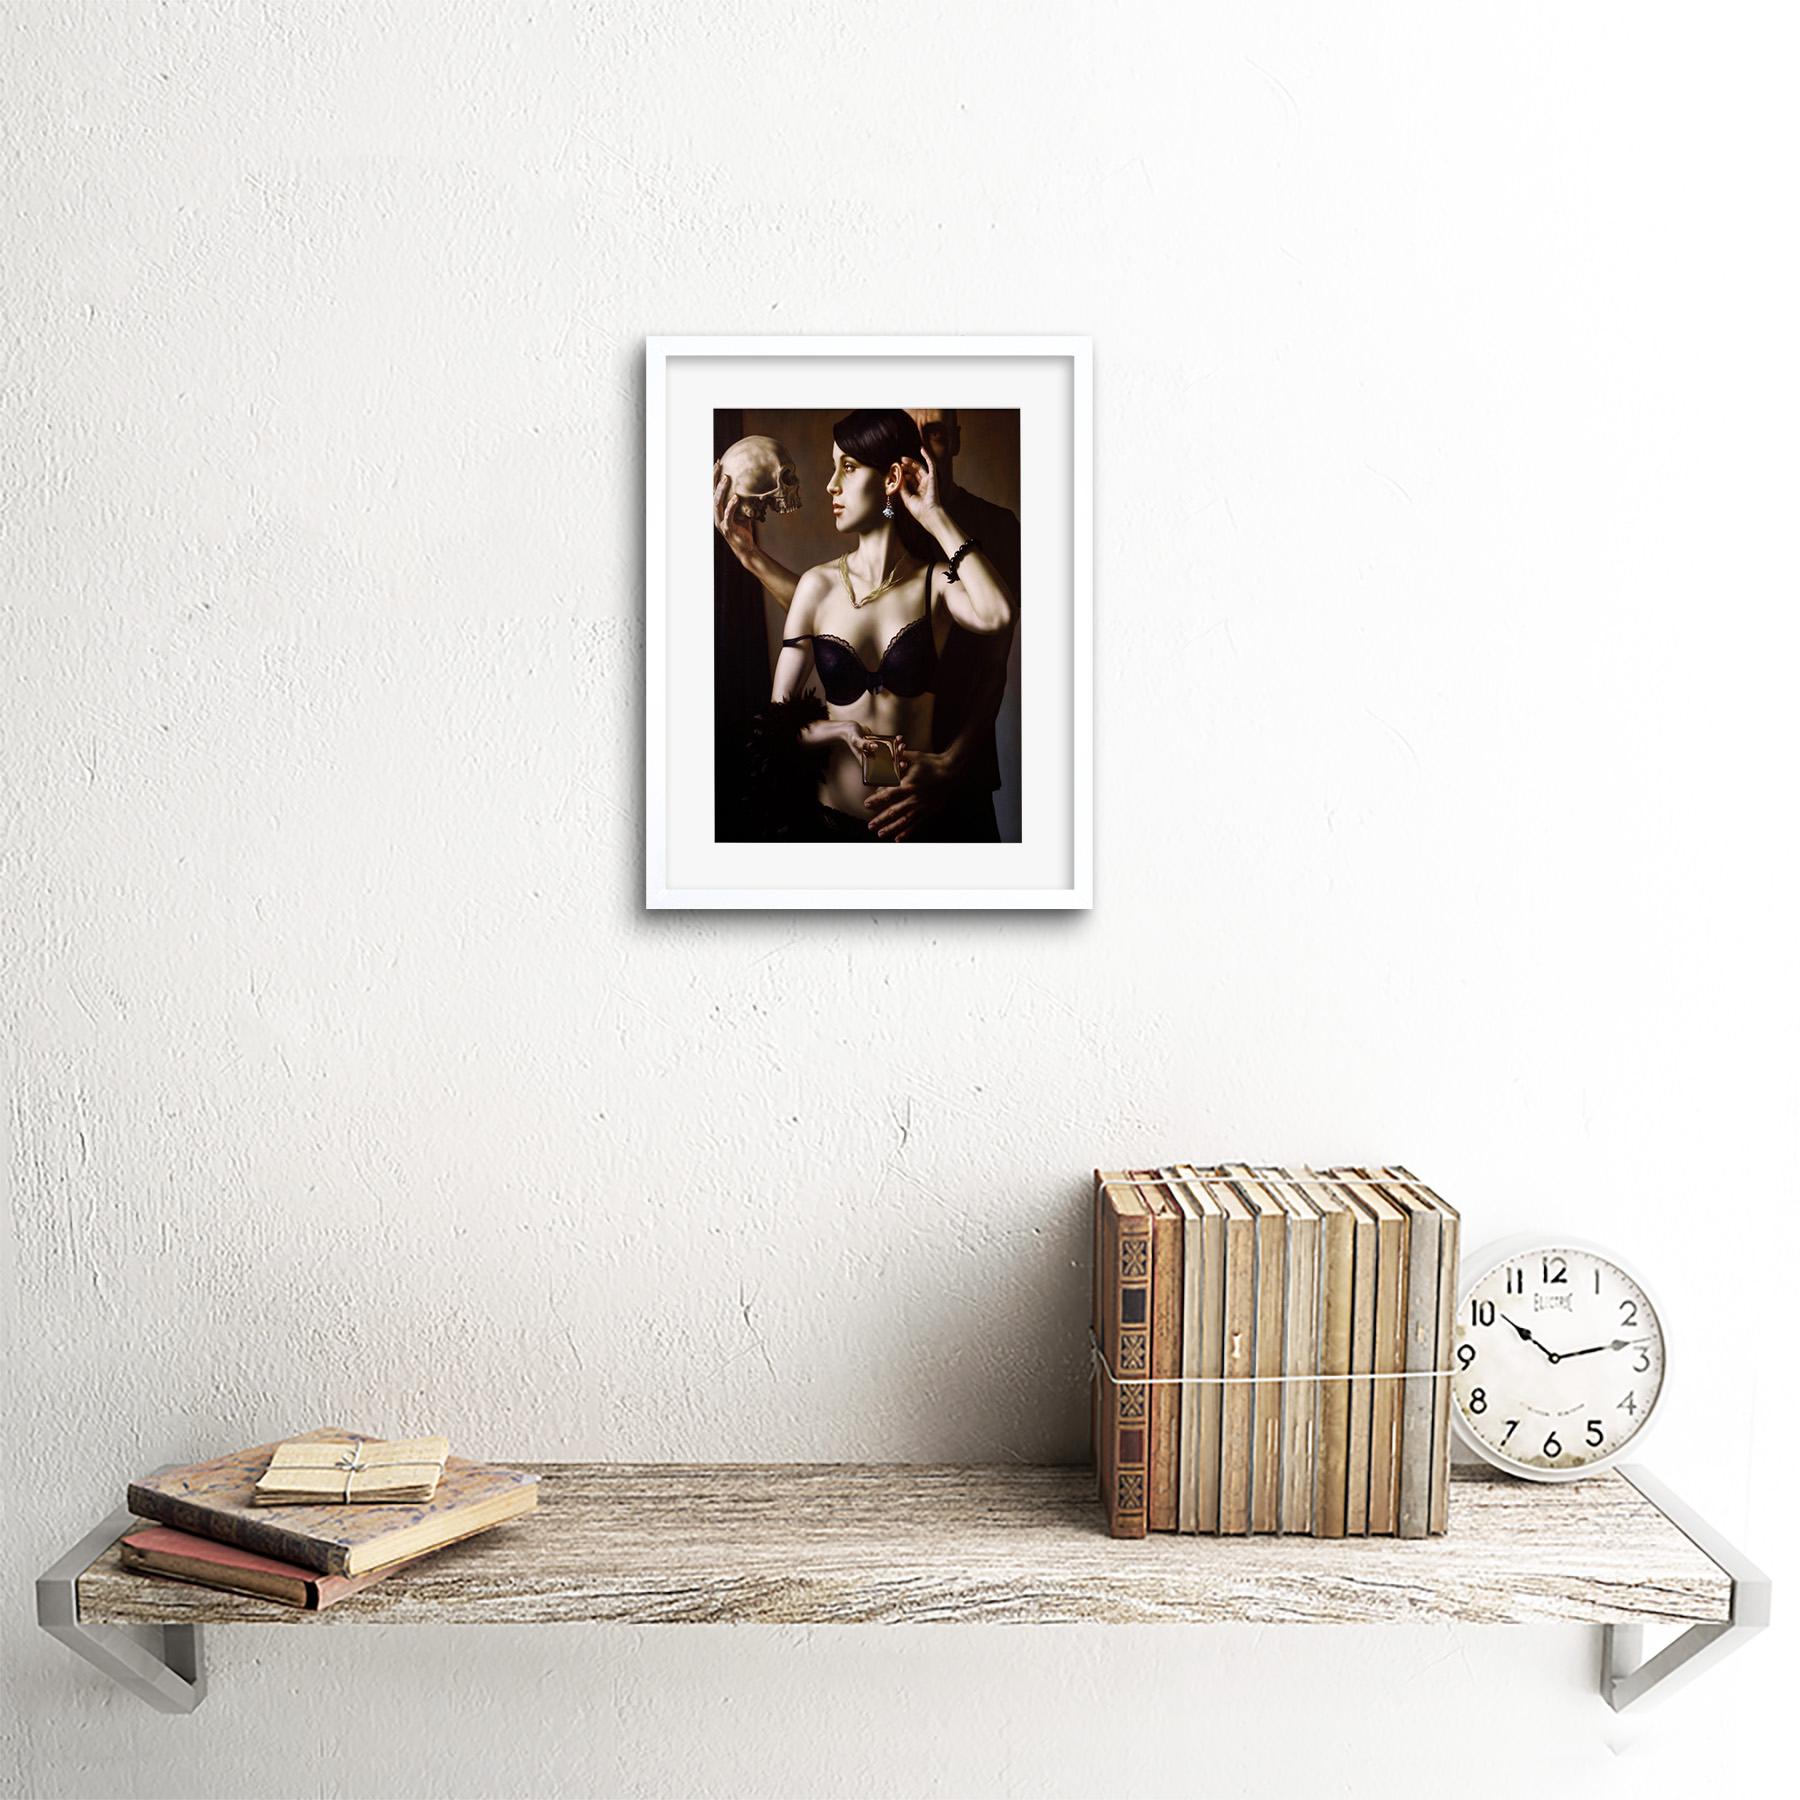 Painting-Balcar-Send-Me-To-The-Future-Framed-Art-Print-9x7-Inch 縮圖 18